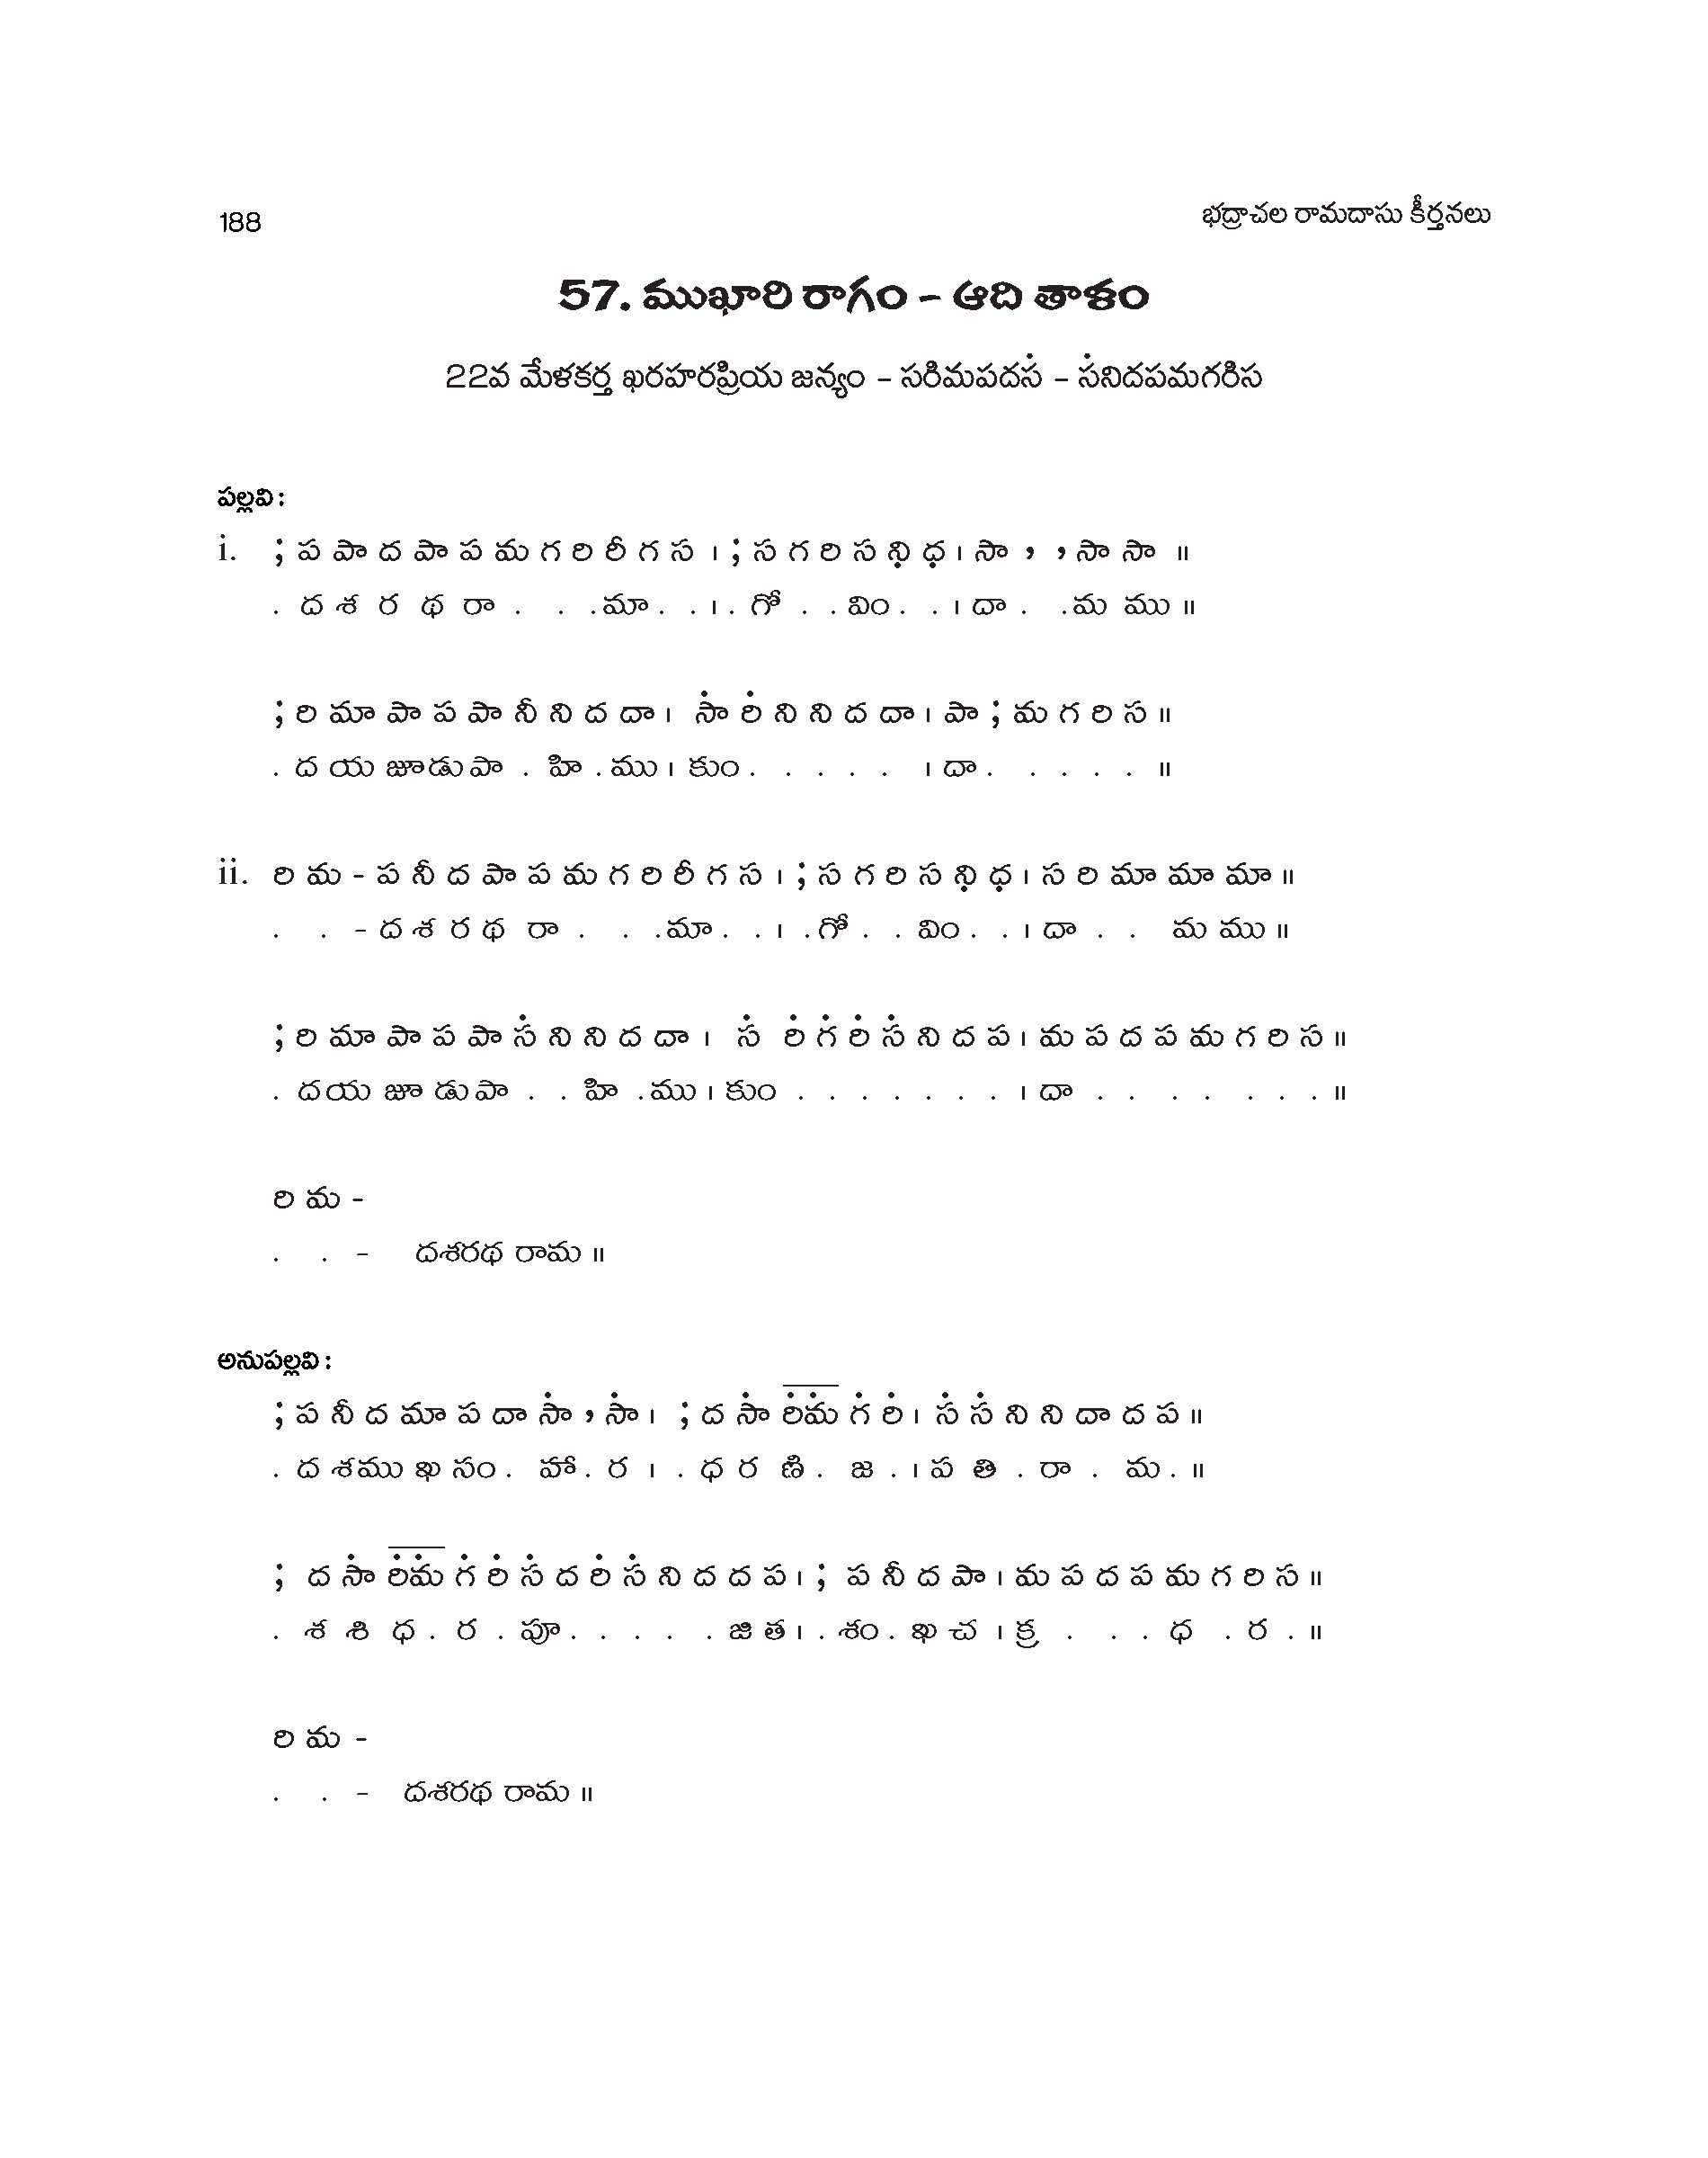 mukaari ragam adi thalam, bhadrachala ramadasu keertanalu